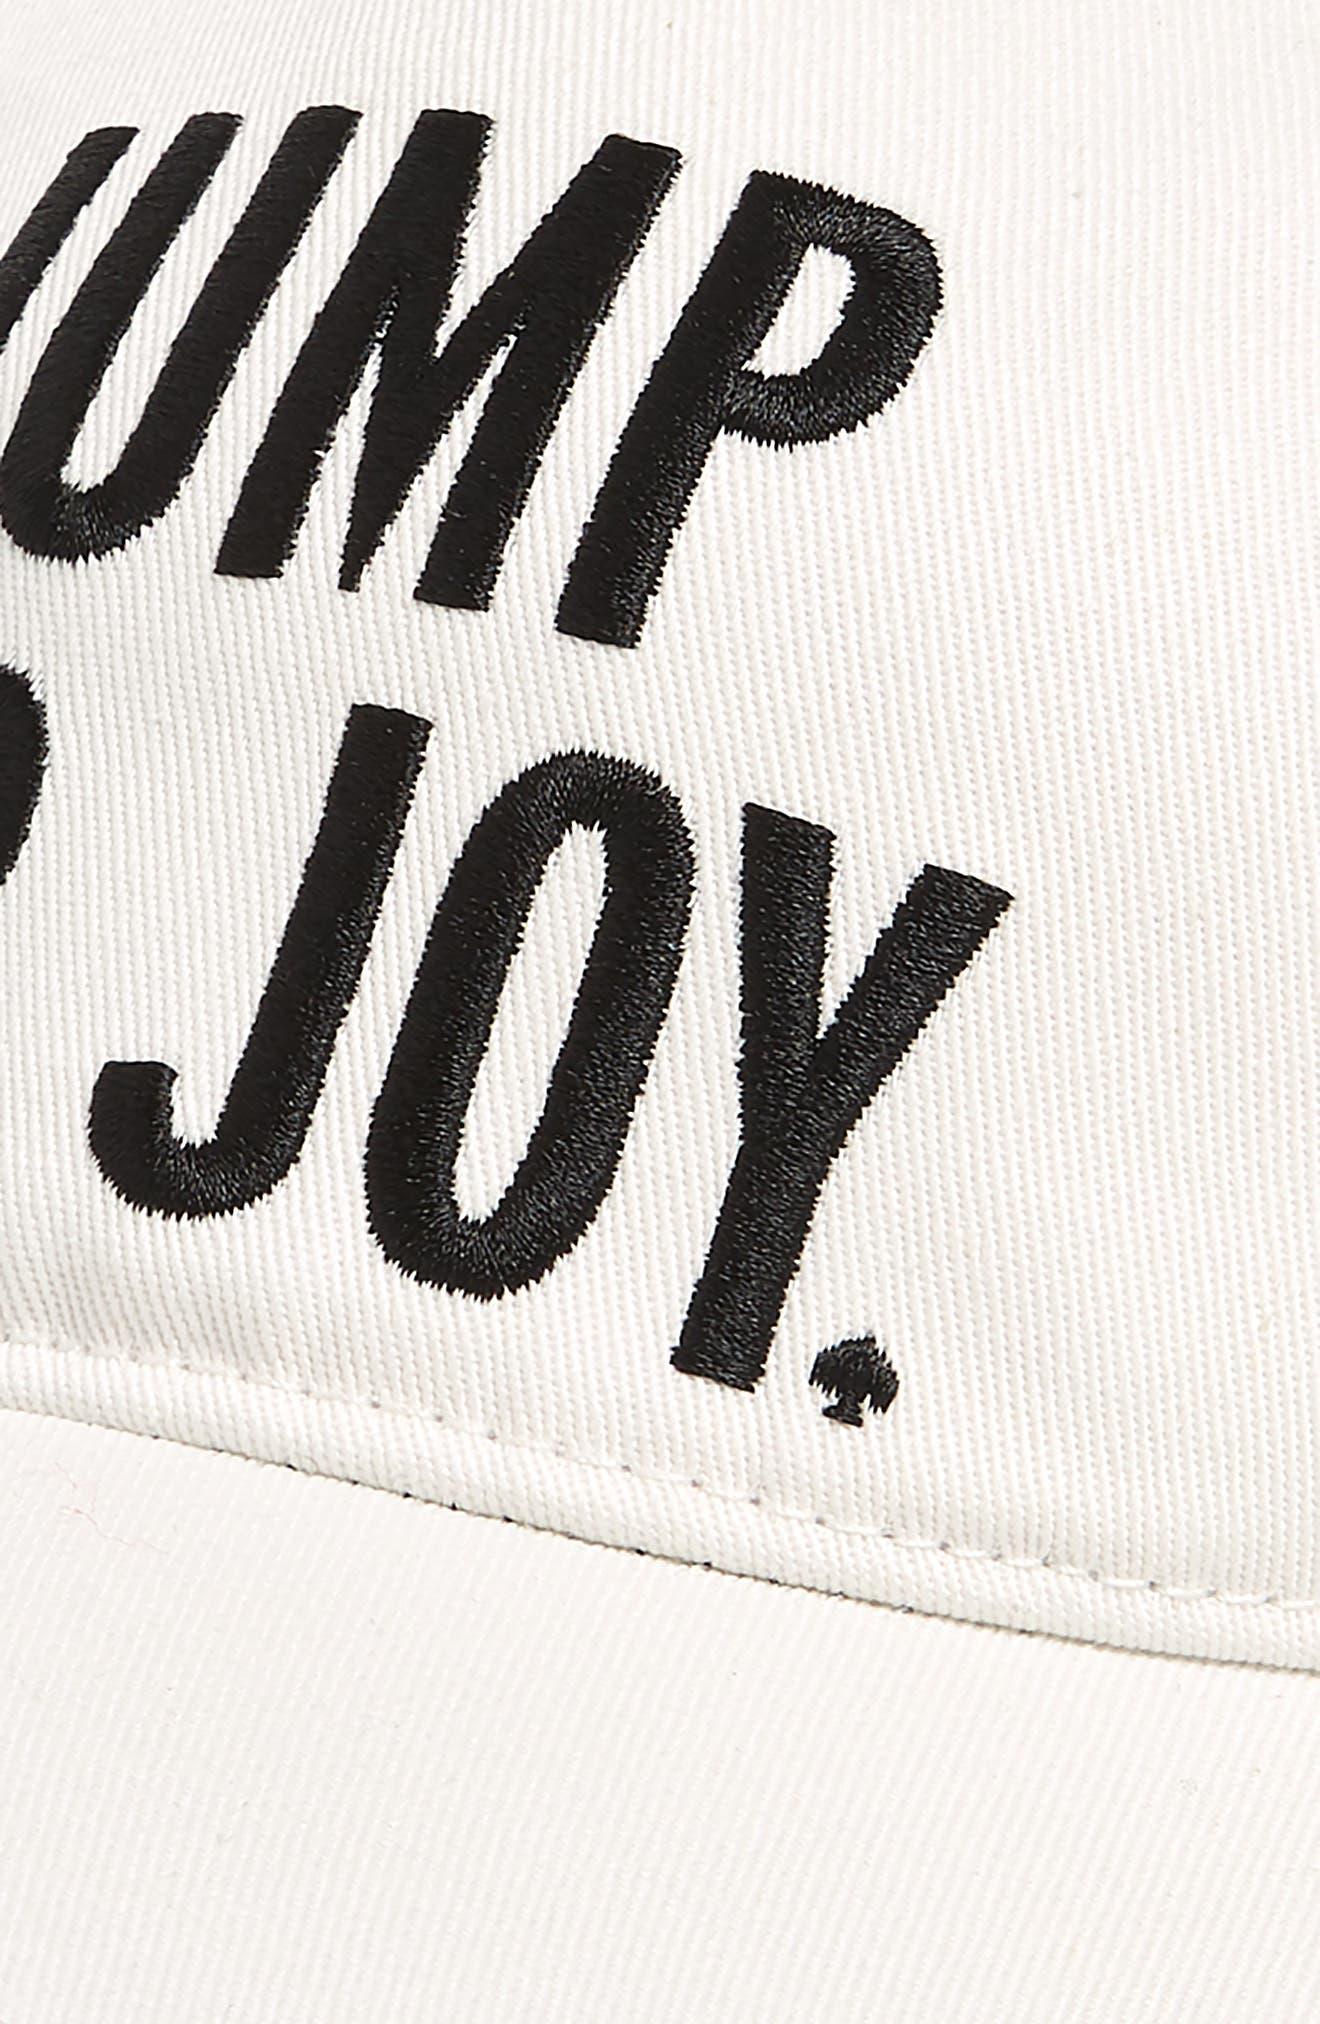 KATE SPADE NEW YORK,                             jump for joy cap,                             Alternate thumbnail 3, color,                             100